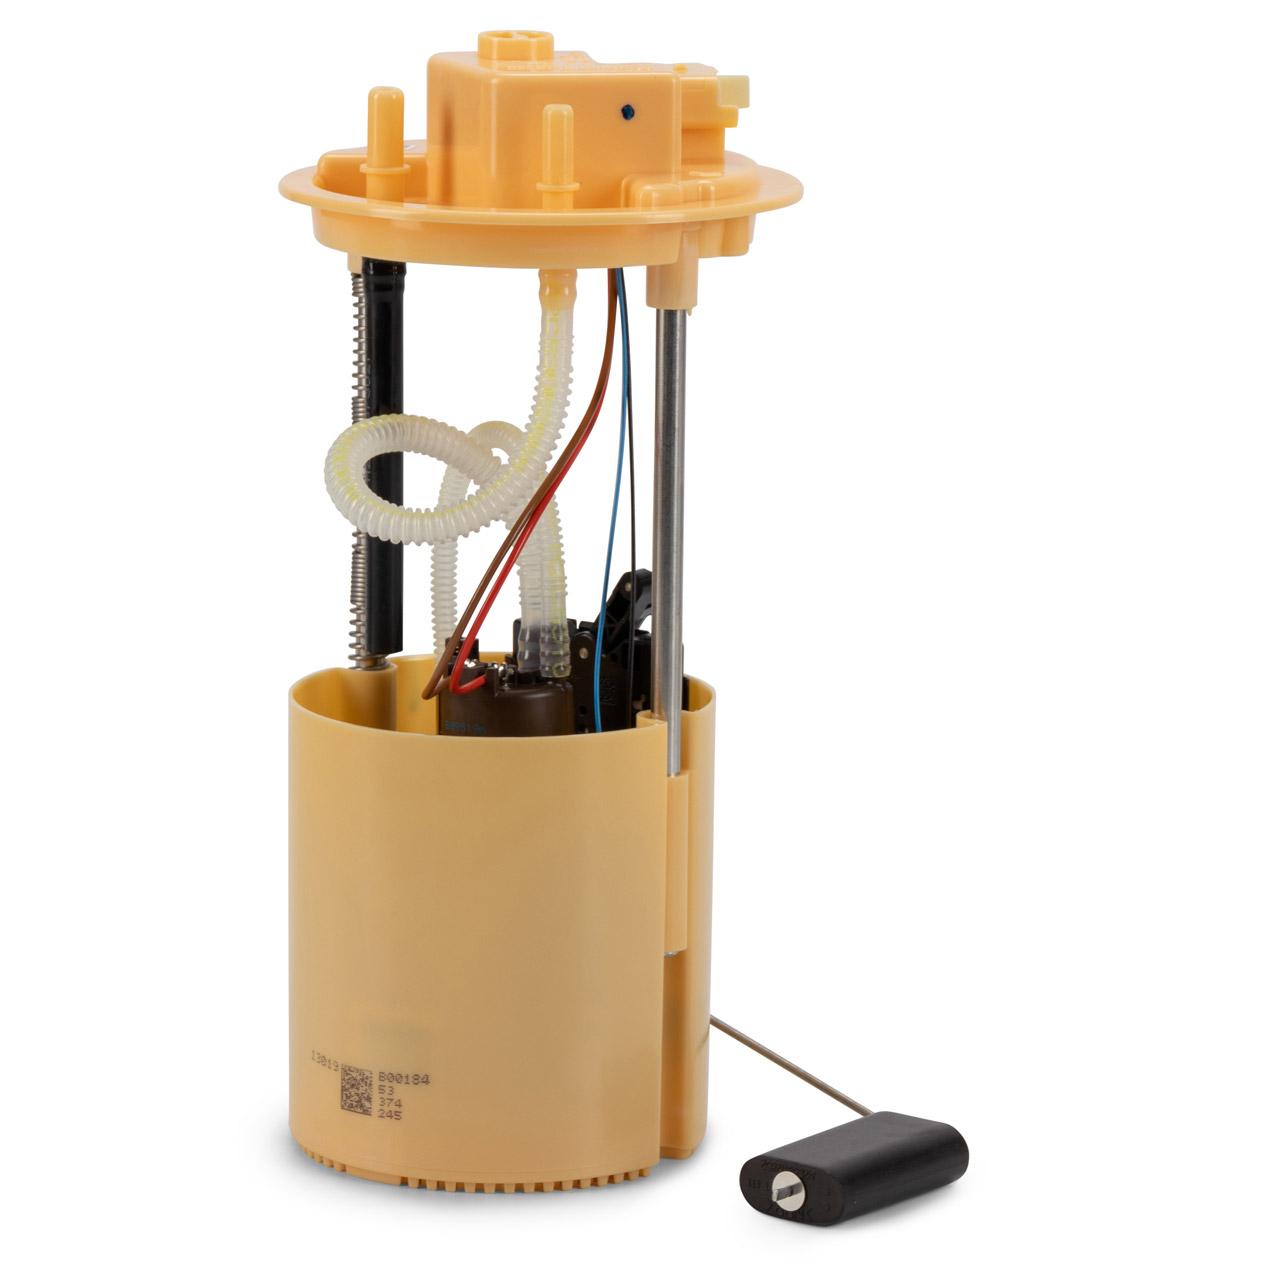 Kraftstoffpumpe Dieselpumpe OPEL Meriva B (S10) 1.7 CDTI 815216 / 13311781